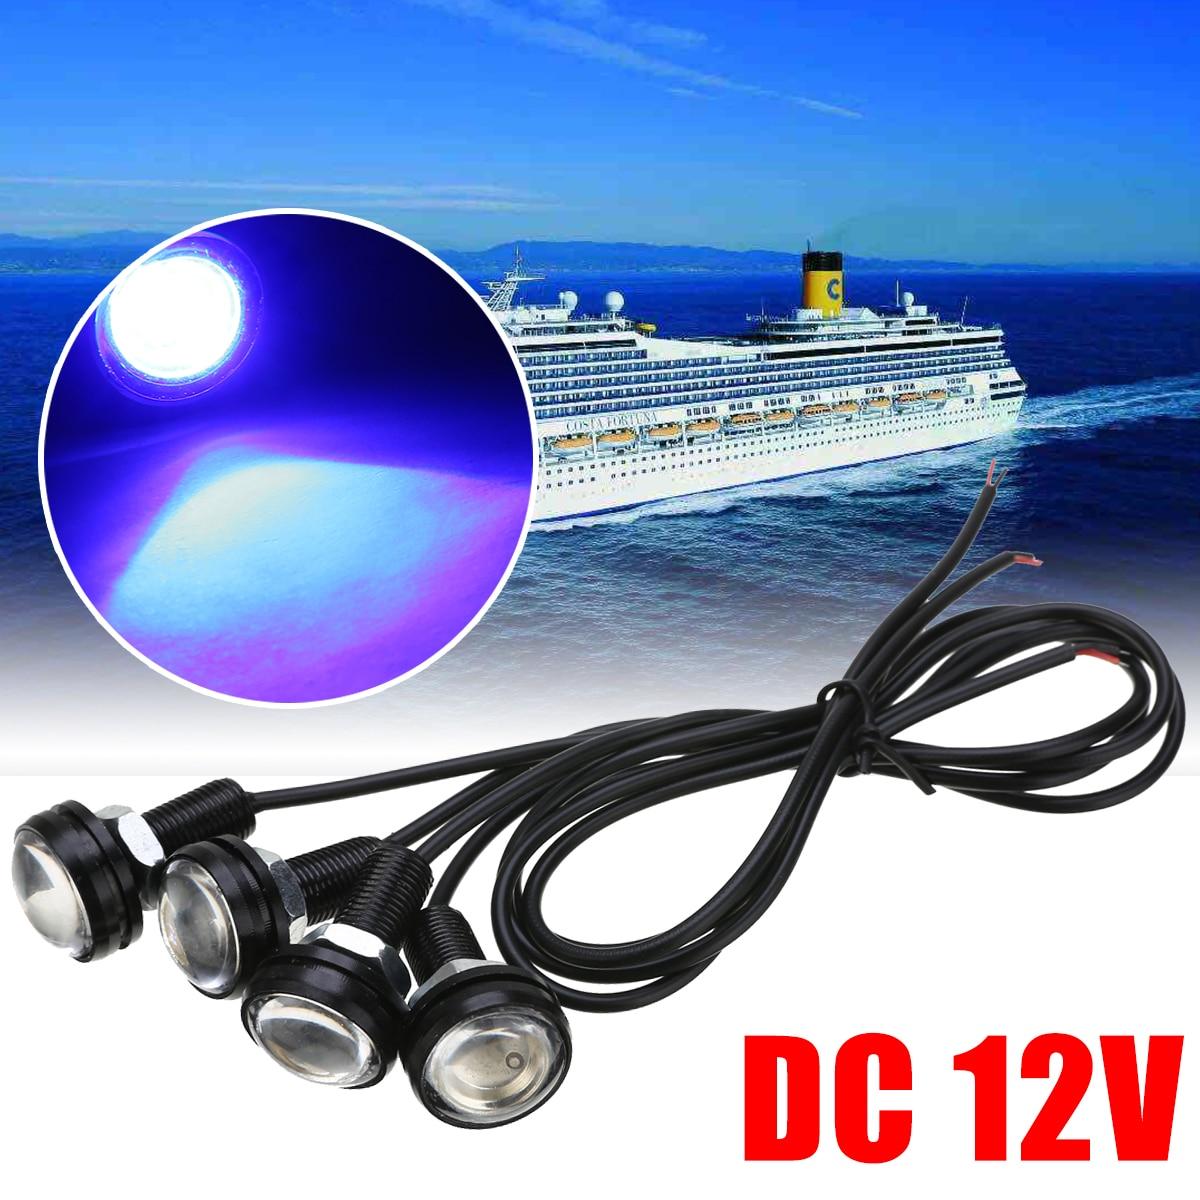 Para luces de barcos marinos 4 Uds 12V 3W azul LED Luz de barco impermeable extensor de Outrigger trapeador bajo el agua lámpara de señal de peces